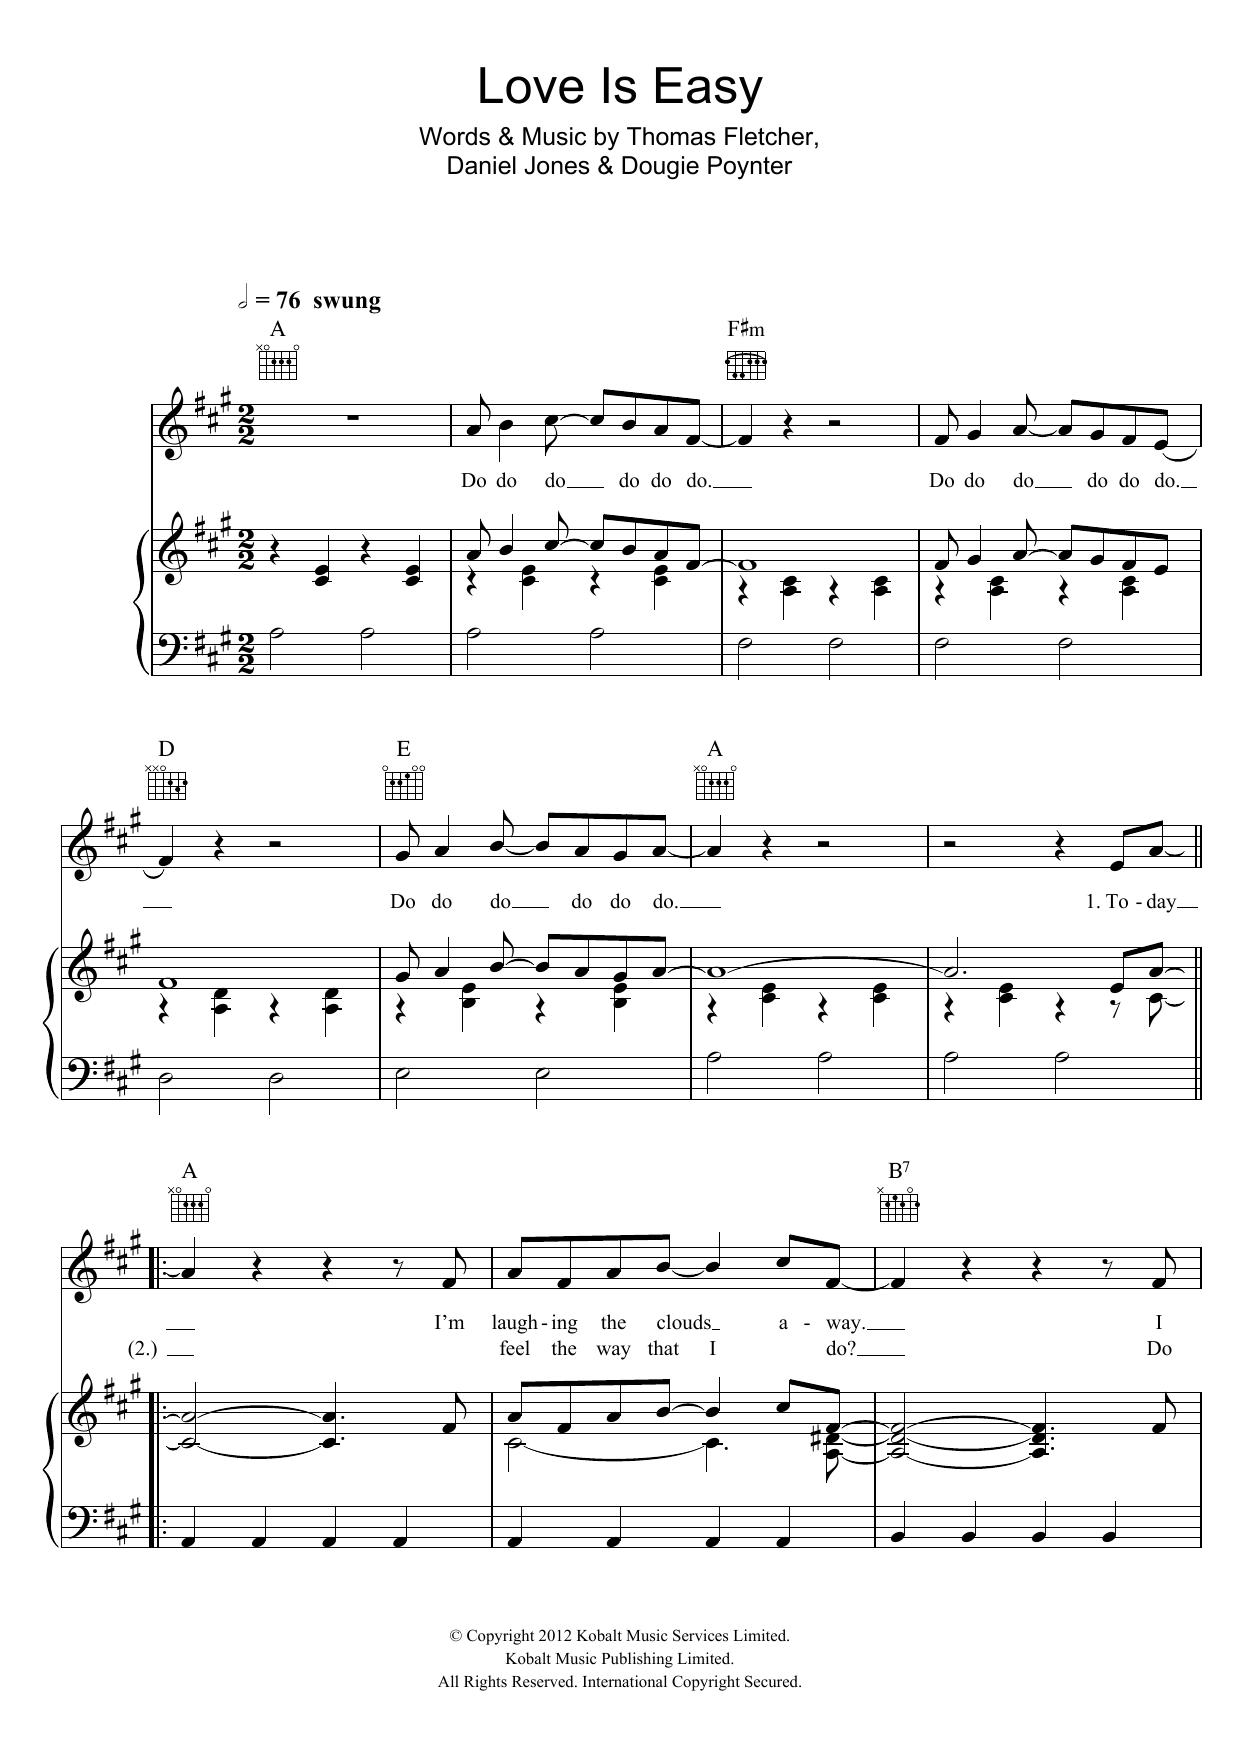 Sheet Music Digital Files To Print Licensed Mcfly Digital Sheet Music